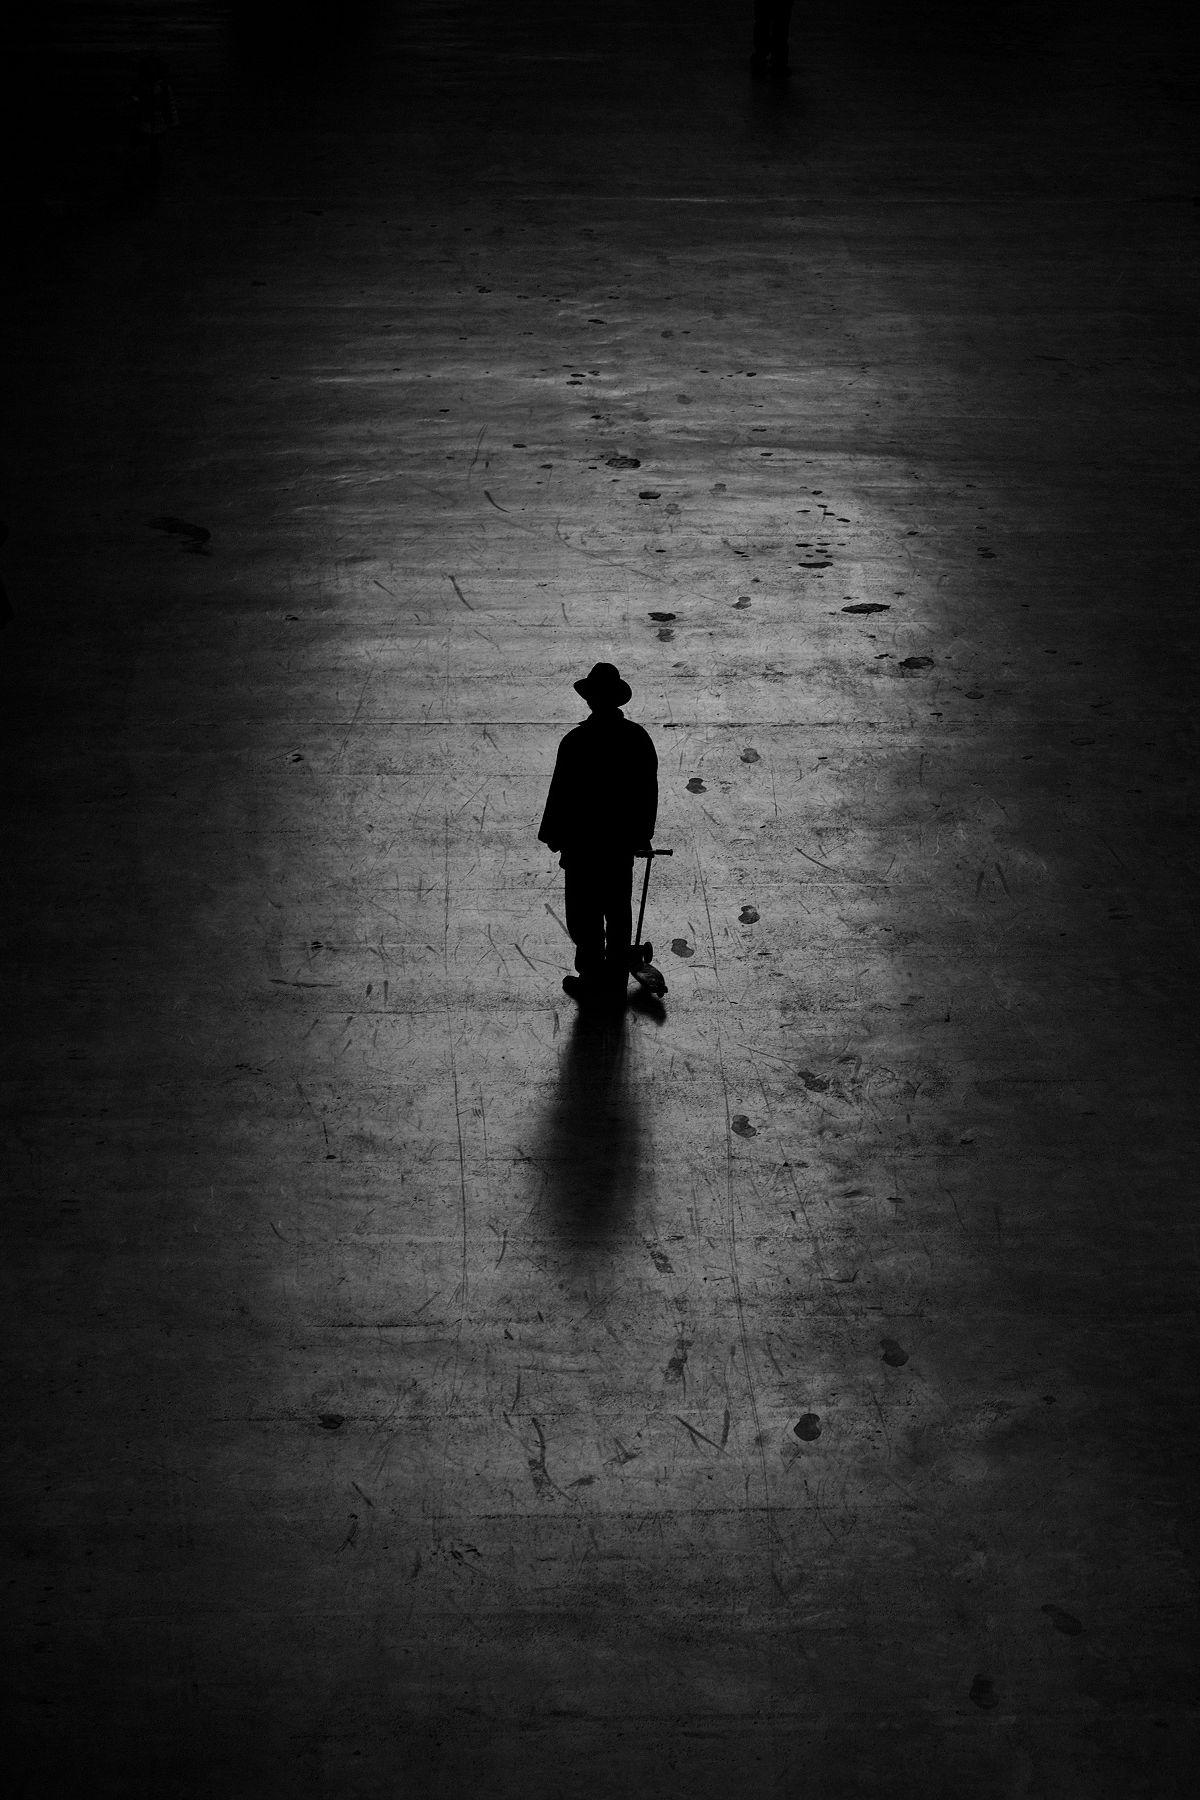 Nicholas Goodden - Man at Tate modern.jpg